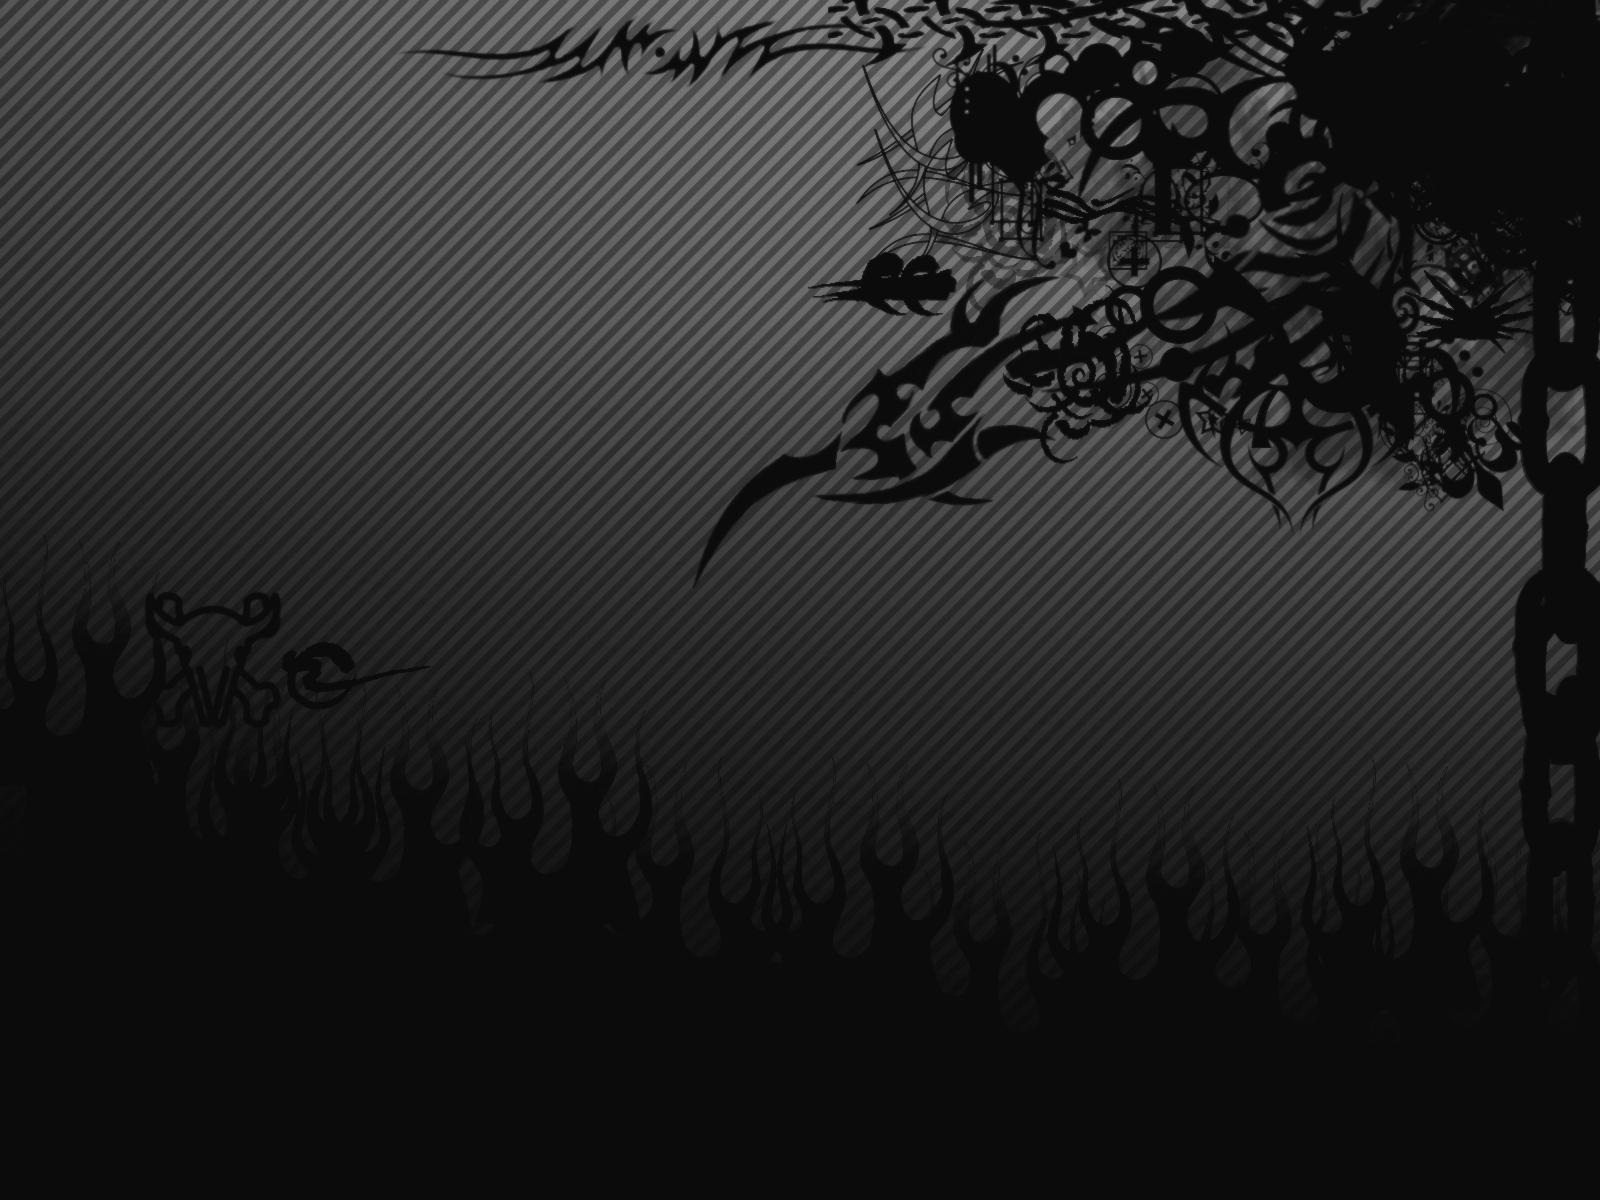 grey black wallpaper by v1n3 customization wallpaper abstract 2008 1600x1200